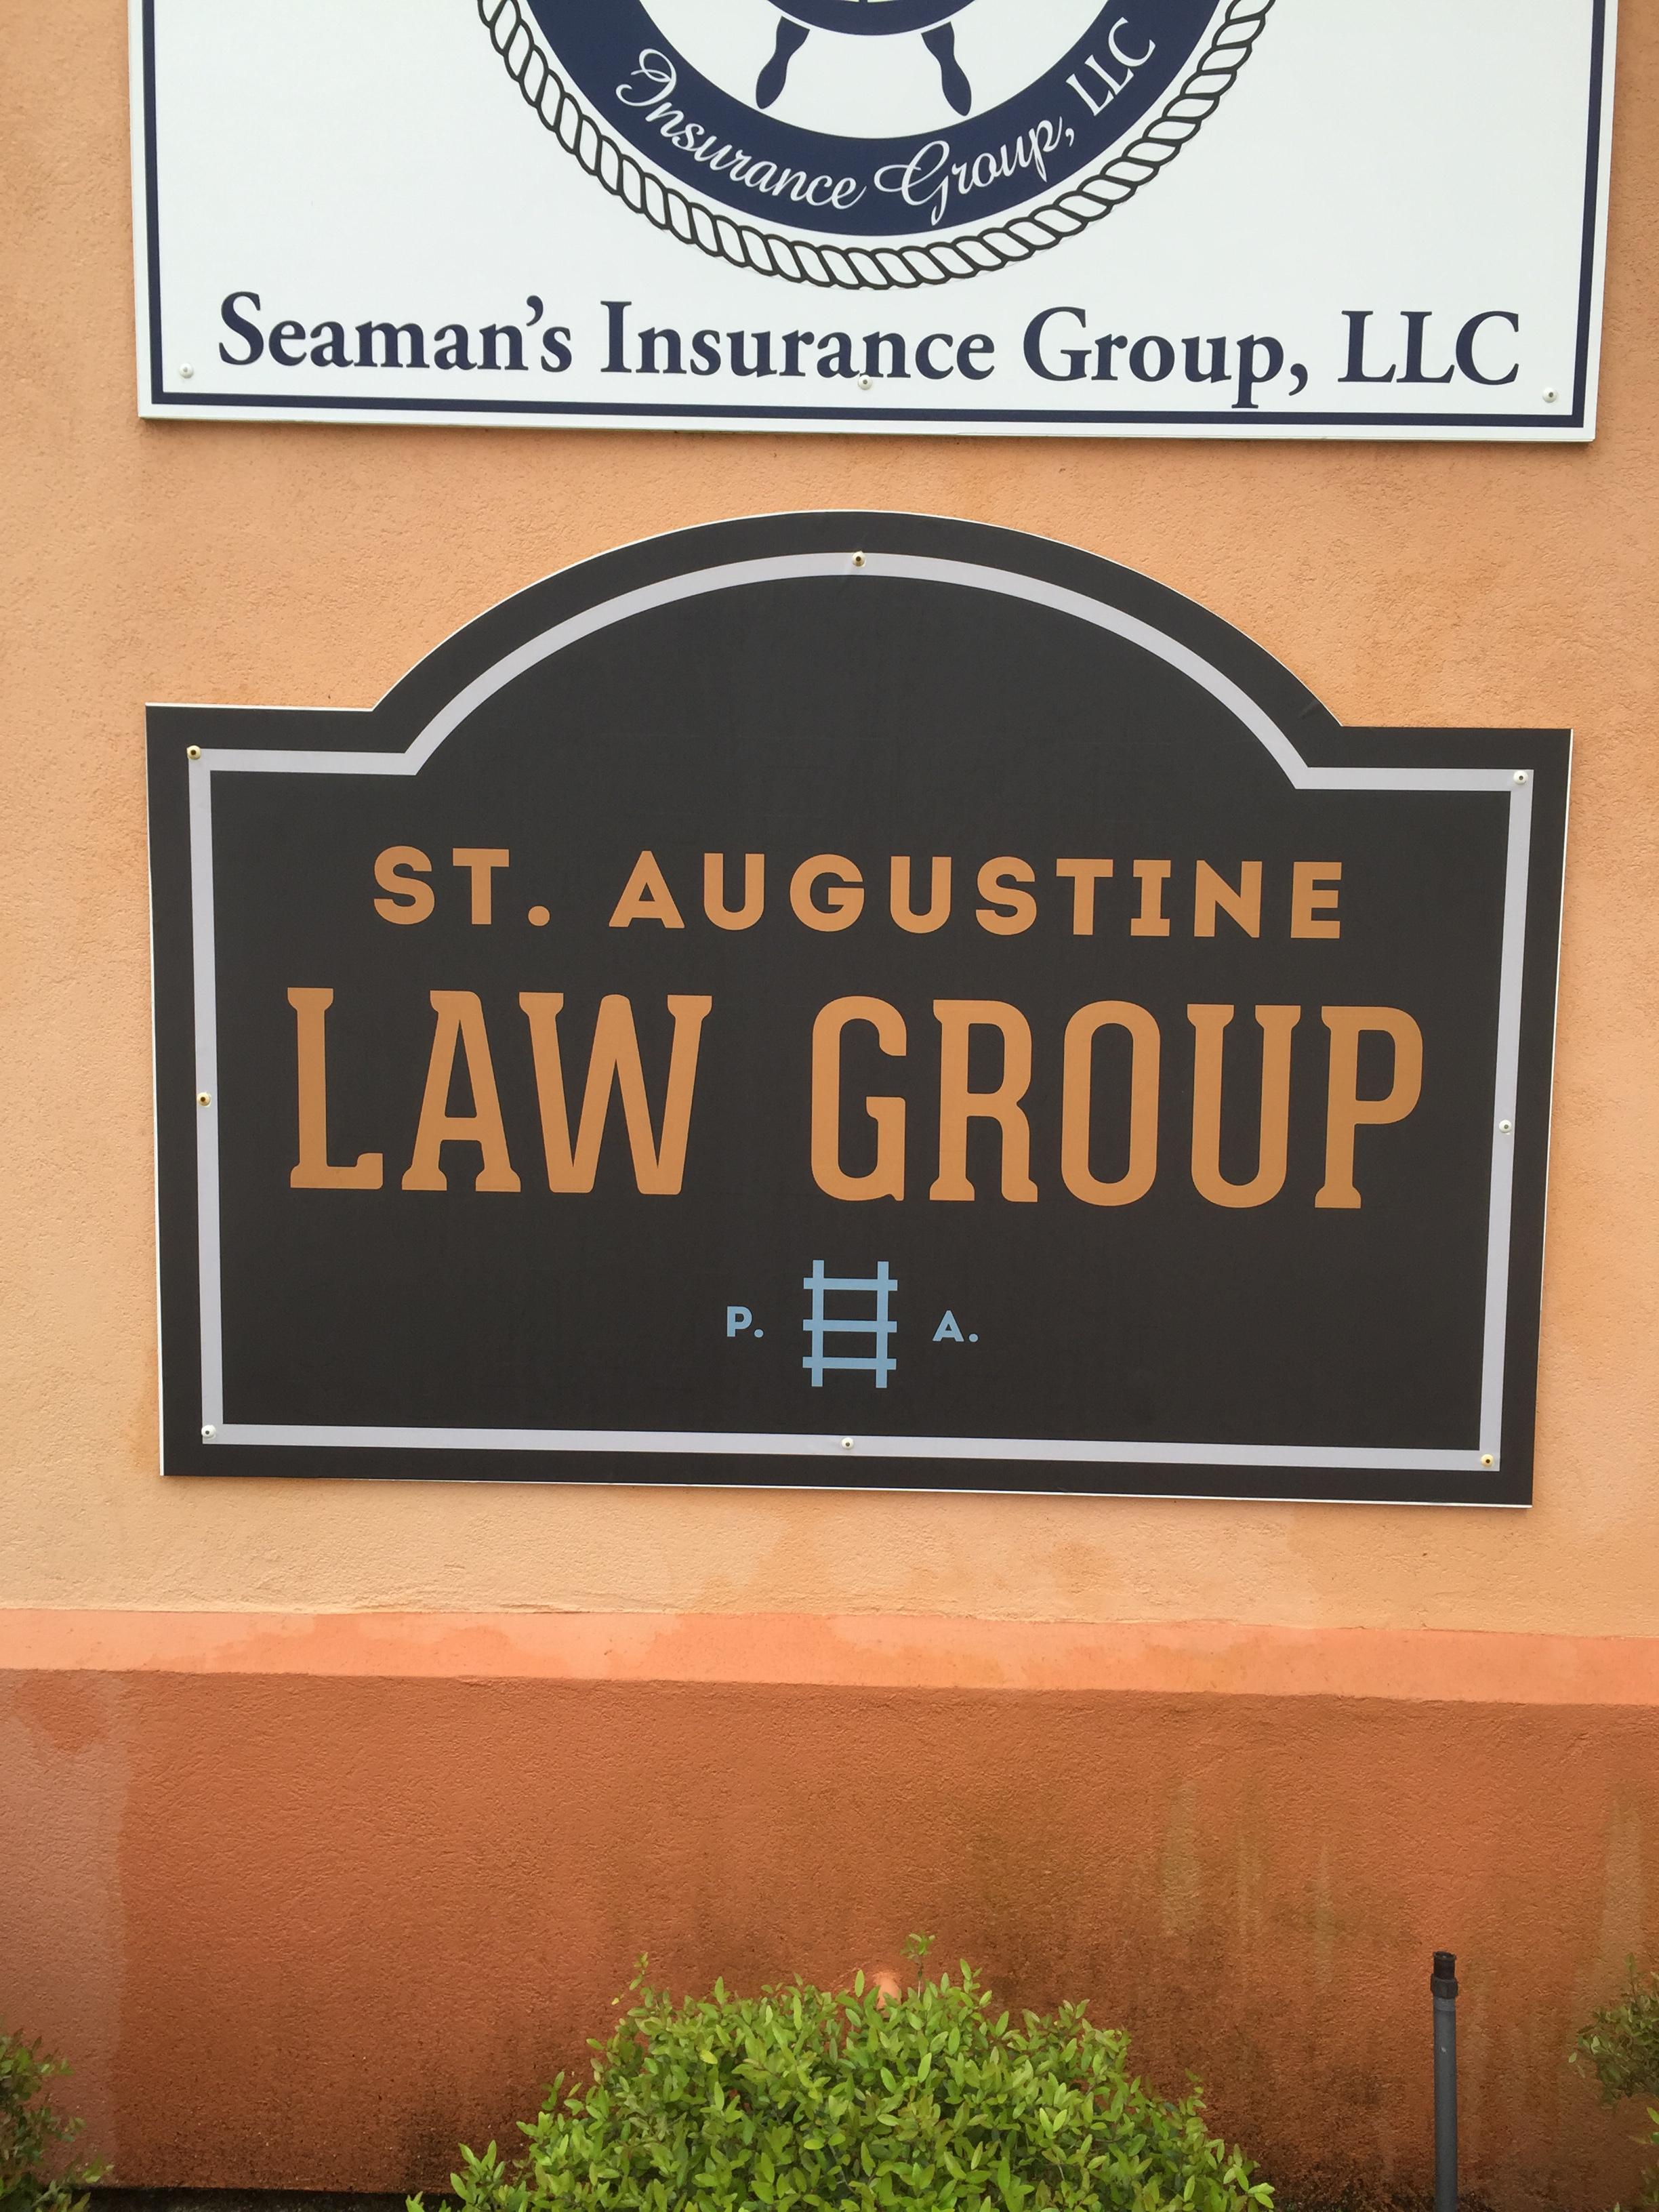 StAugustineLawGroup_Sign